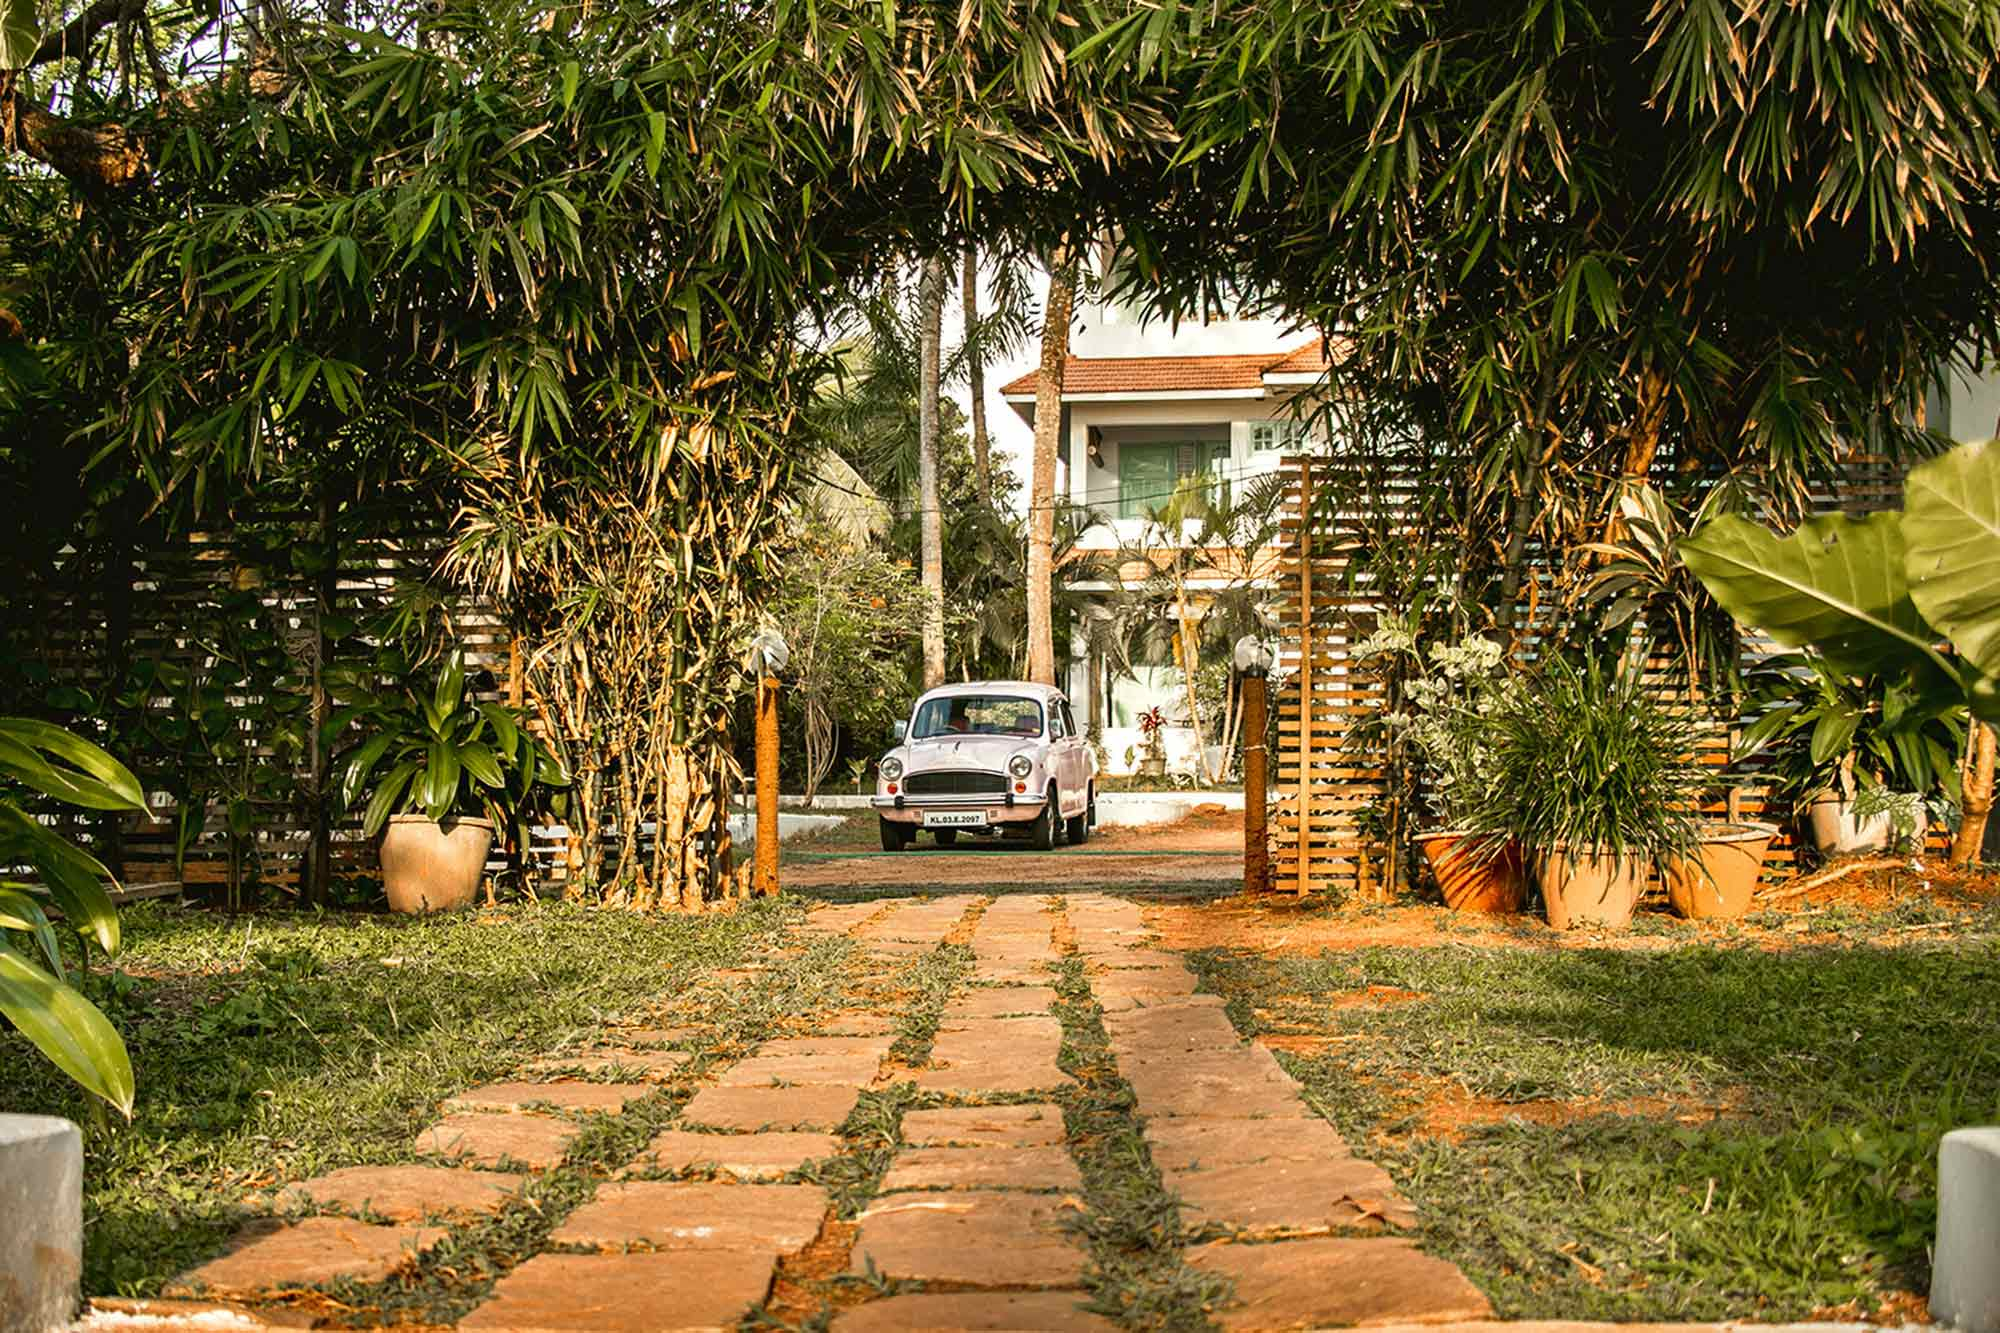 https://www.soulandsurf.com/wp-content/uploads/2021/09/Retreatsindia-images-SS-Kerala-Website-2-stay.jpg